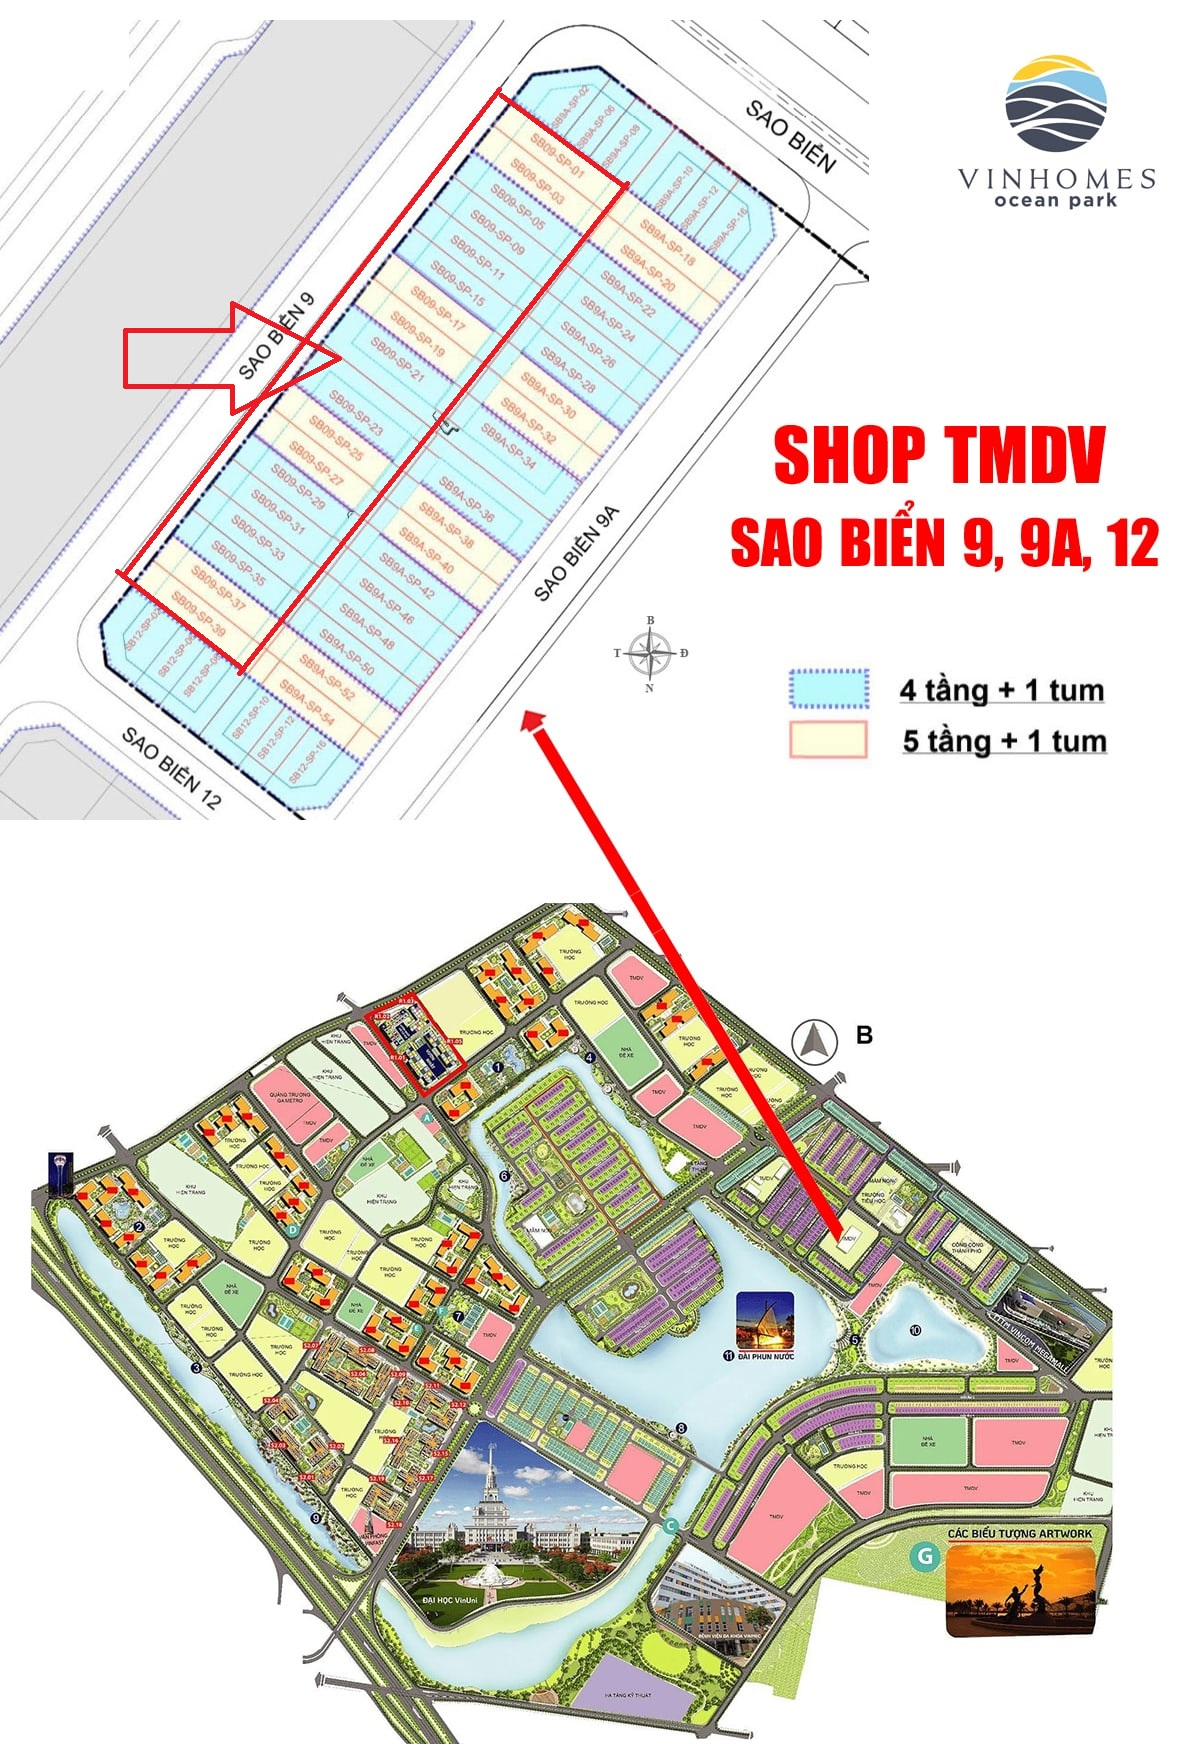 ban-shophouse-sao-bien-09-shop-tmdv-sao-bien-09